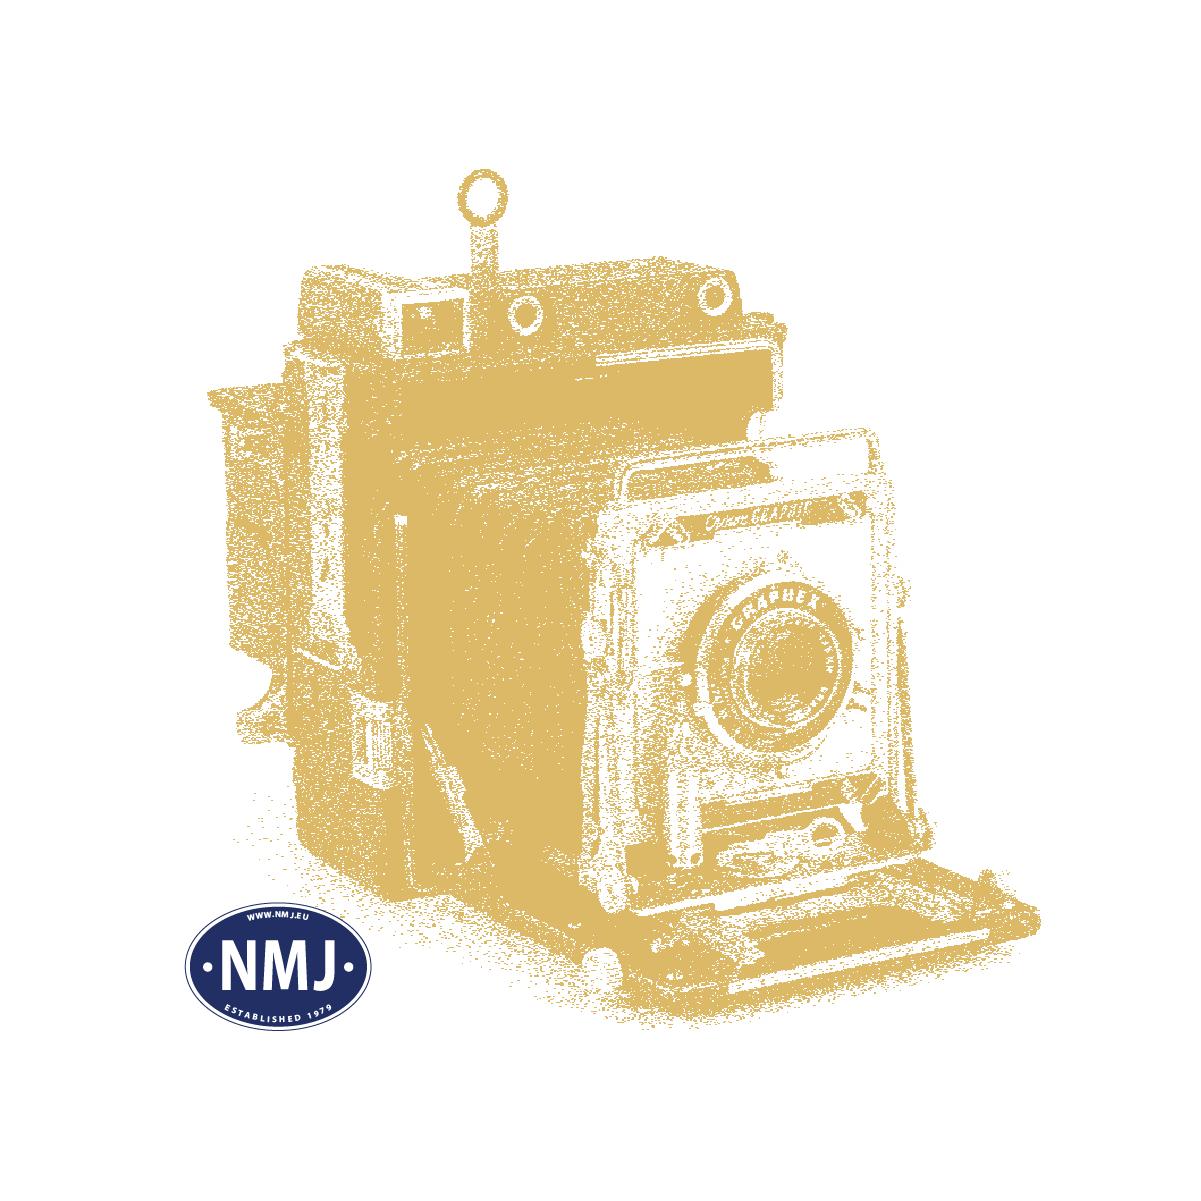 Topline Personvogner, NMJT402.104-MAV Start-CAF-1st Class-Coach-Amz 61 55 19-91 101-5 H0 new colours, NMJT402.104